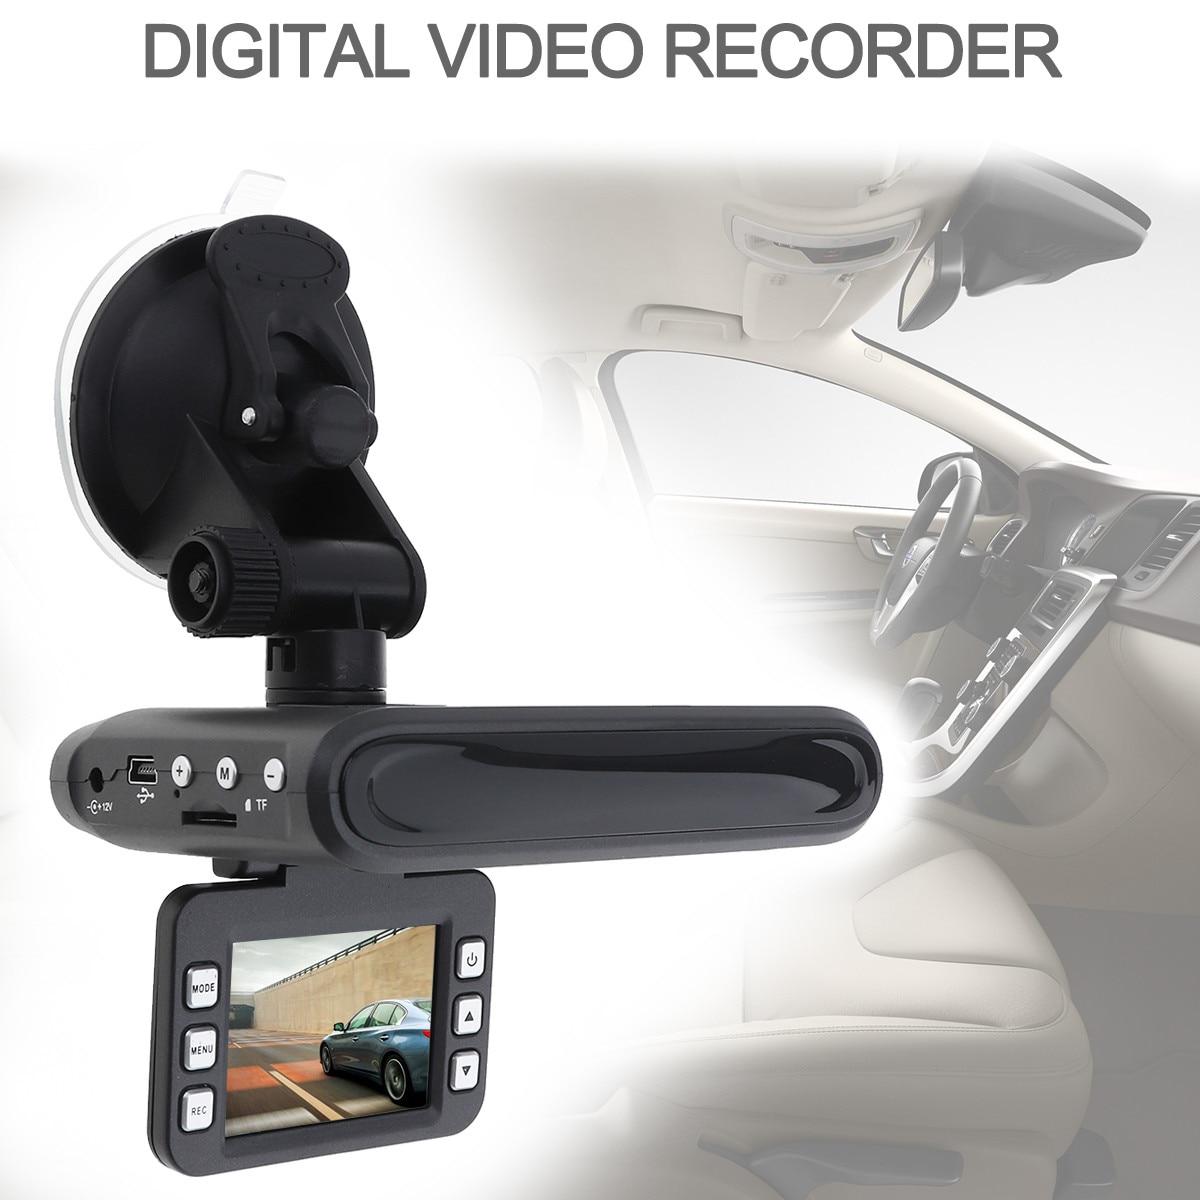 2 in 1 Radar Detector Camera and Car DVR HD Dash Cam Video Recorder with Night Vision G-Sensor Loop Recording Motion Detection plusobd car recorder rearview mirror camera hd dvr for bmw x1 e90 e91 e87 e84 car black box 1080p with g sensor loop recording